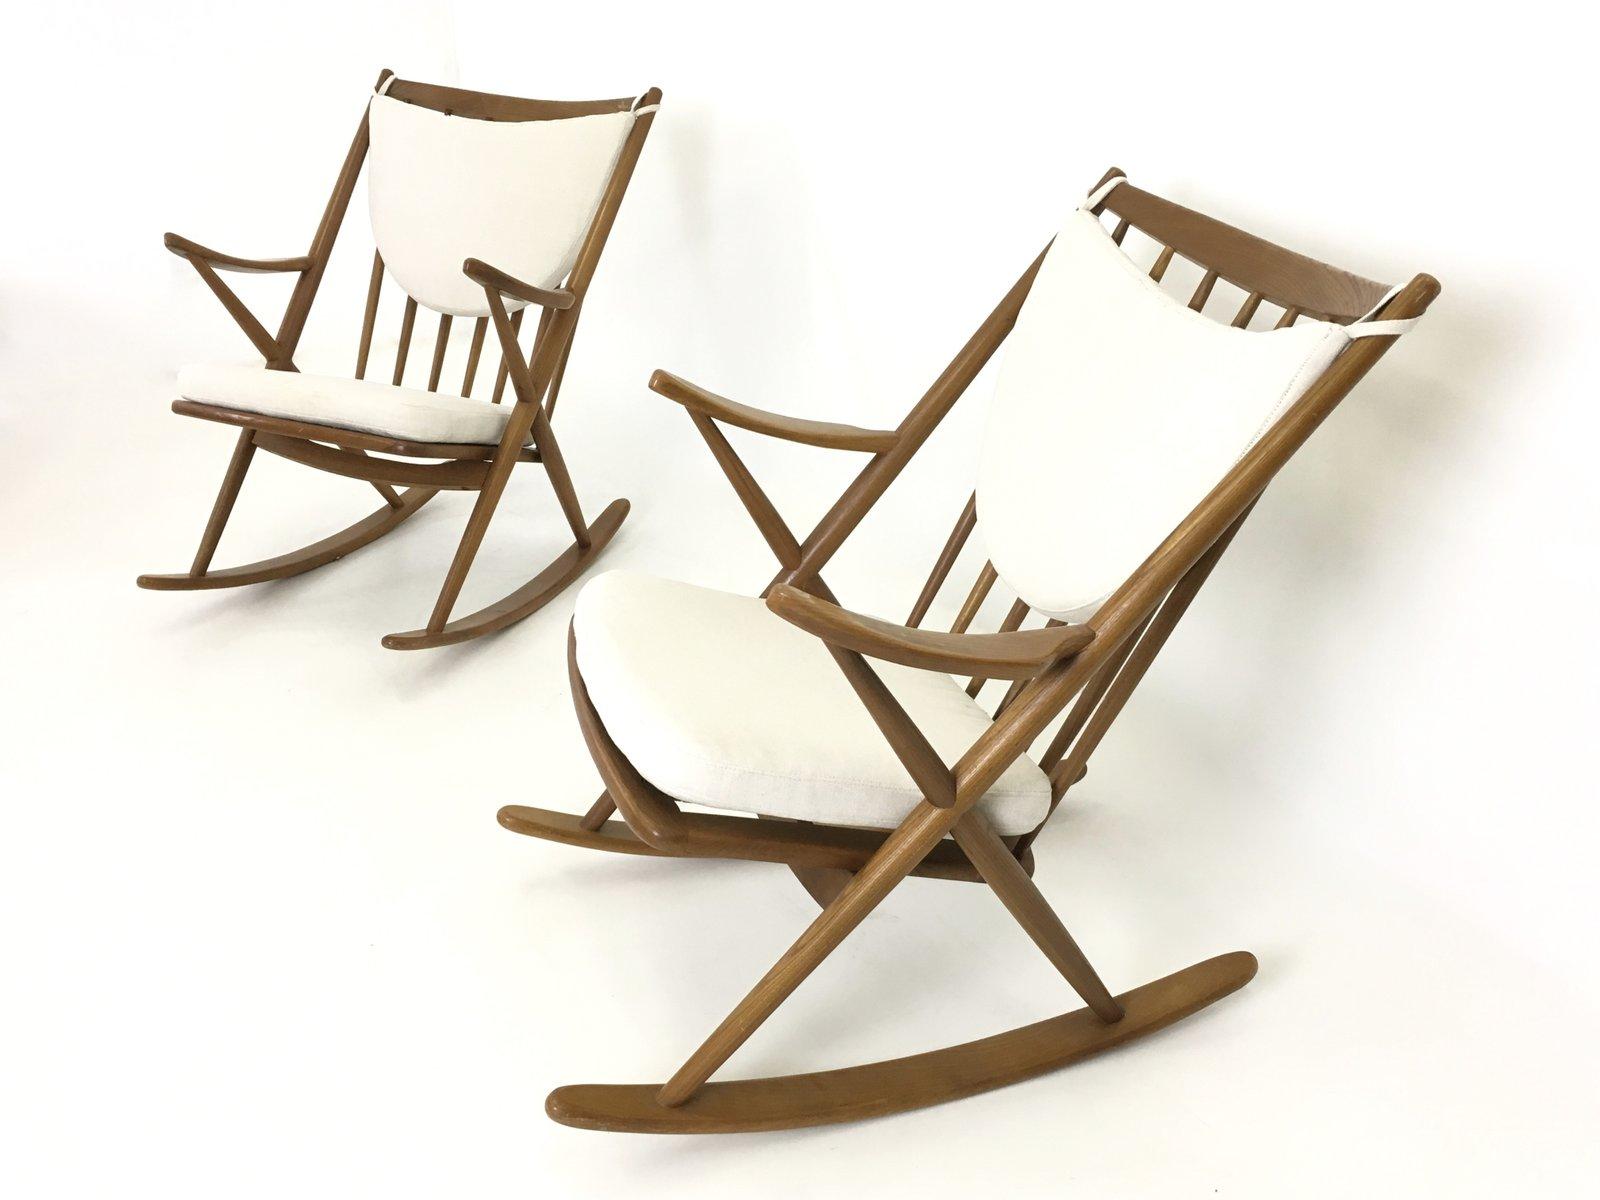 Frank reenskaug rocking chair - Price 2 172 00 Regular Price 2 613 00